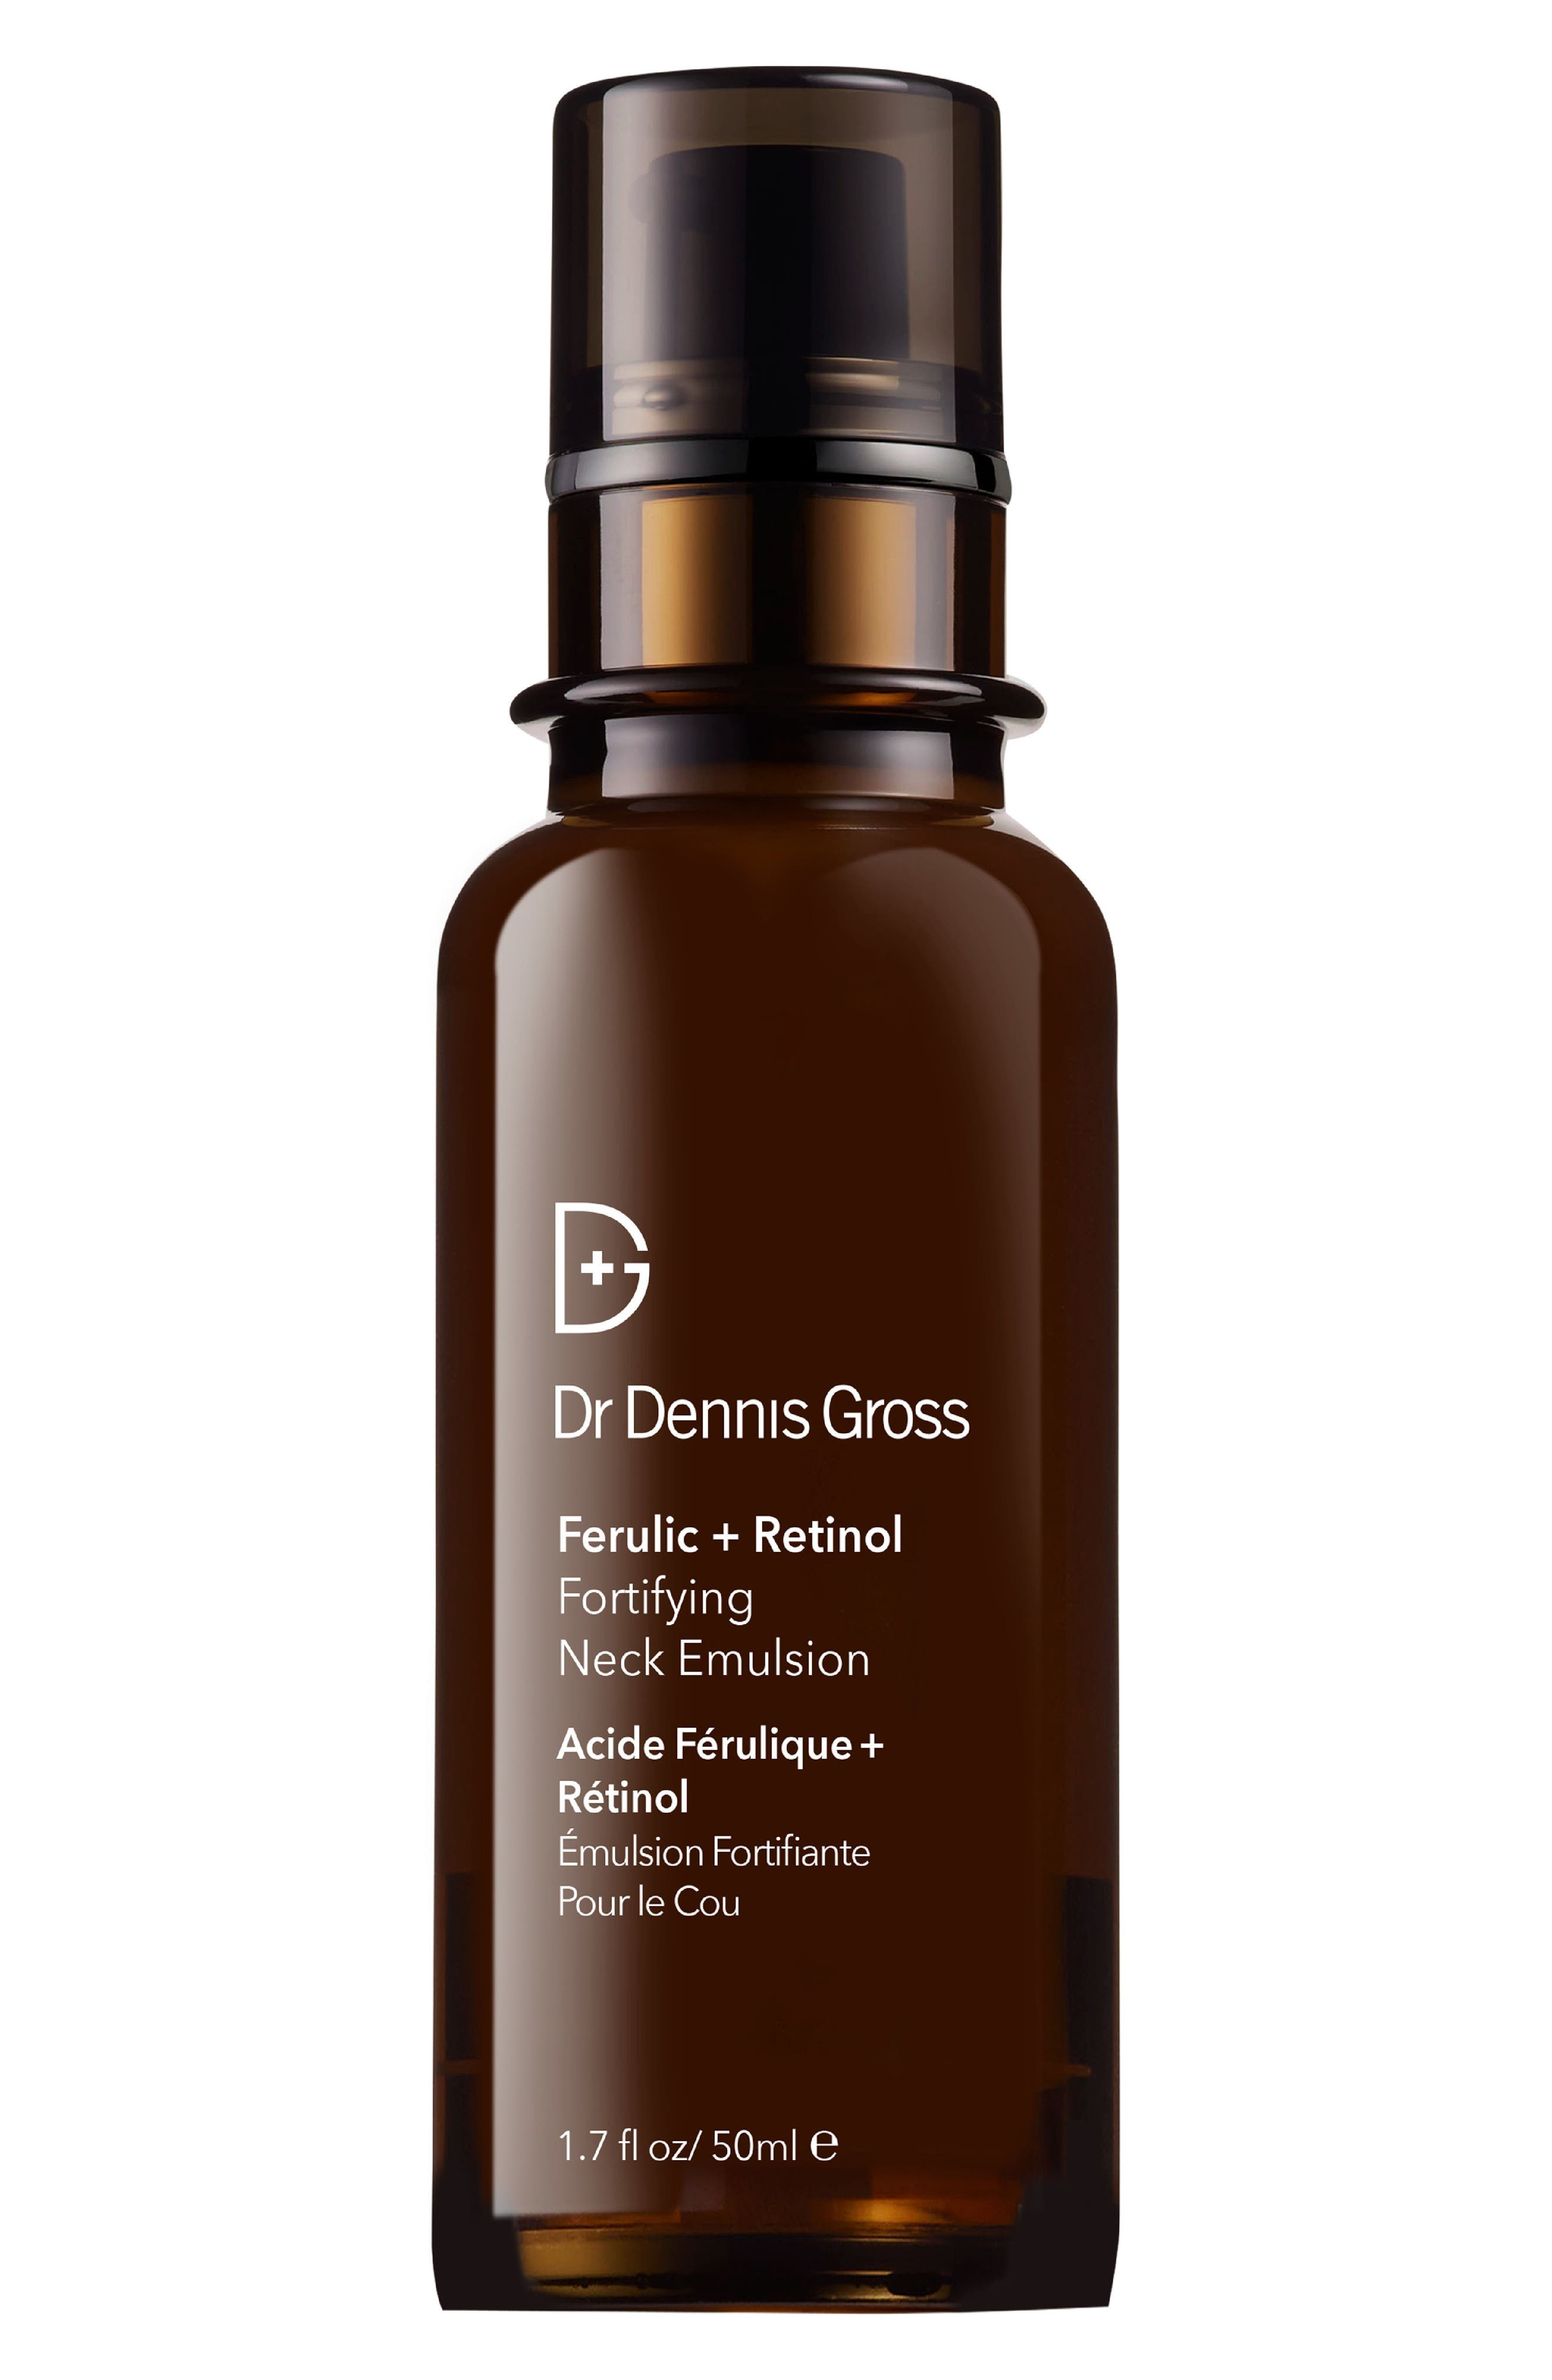 Skincare Ferulic + Retinol Fortifying Neck Emulsion